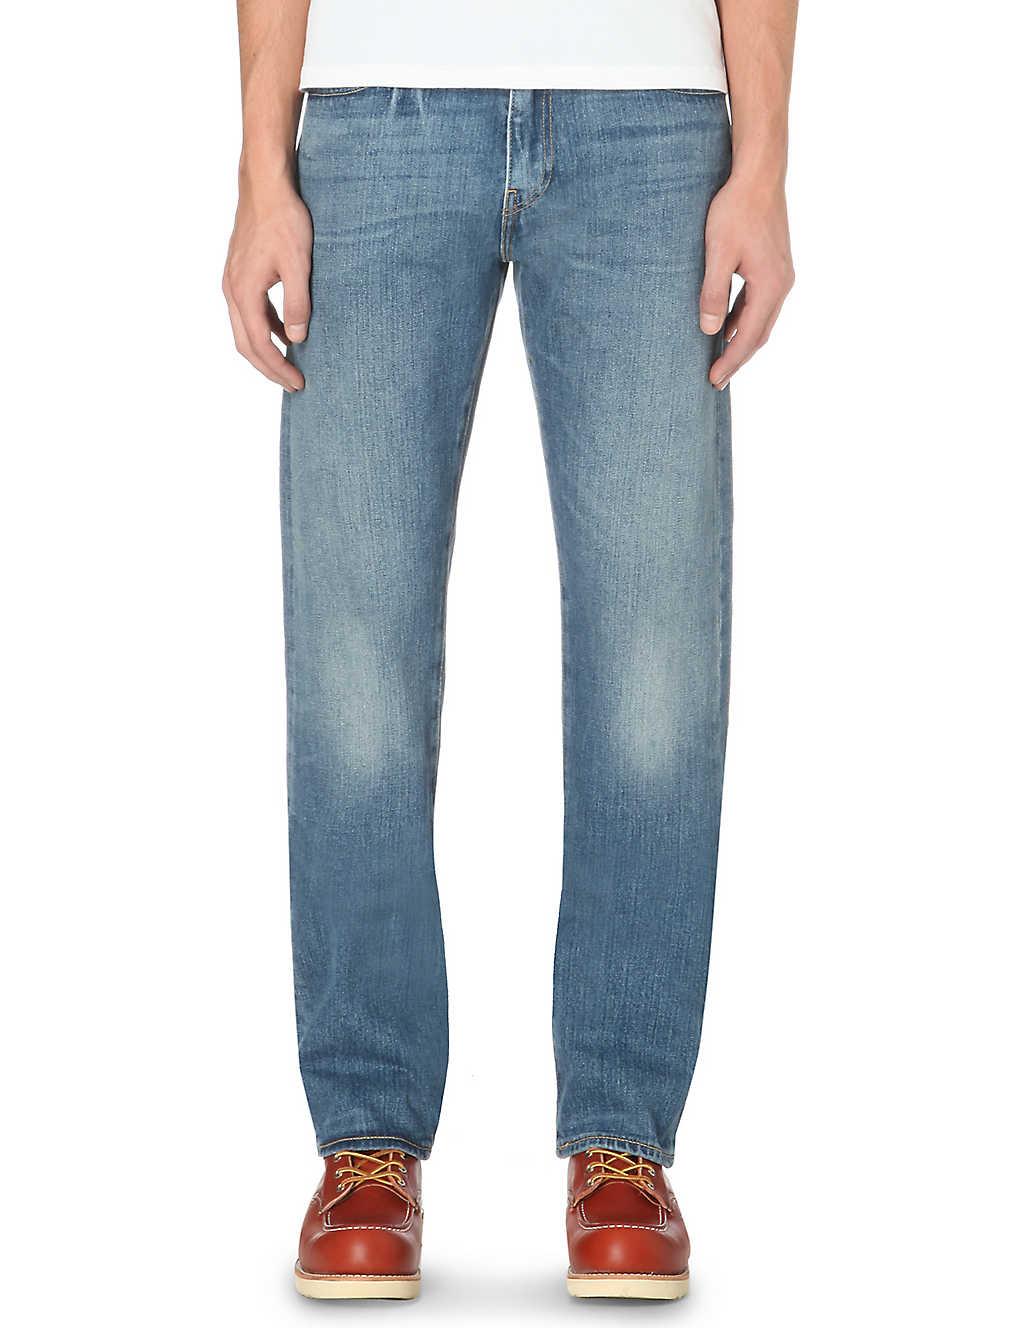 2a2d67b8fb1 LEVI'S - 504 regular-fit straight jeans | Selfridges.com